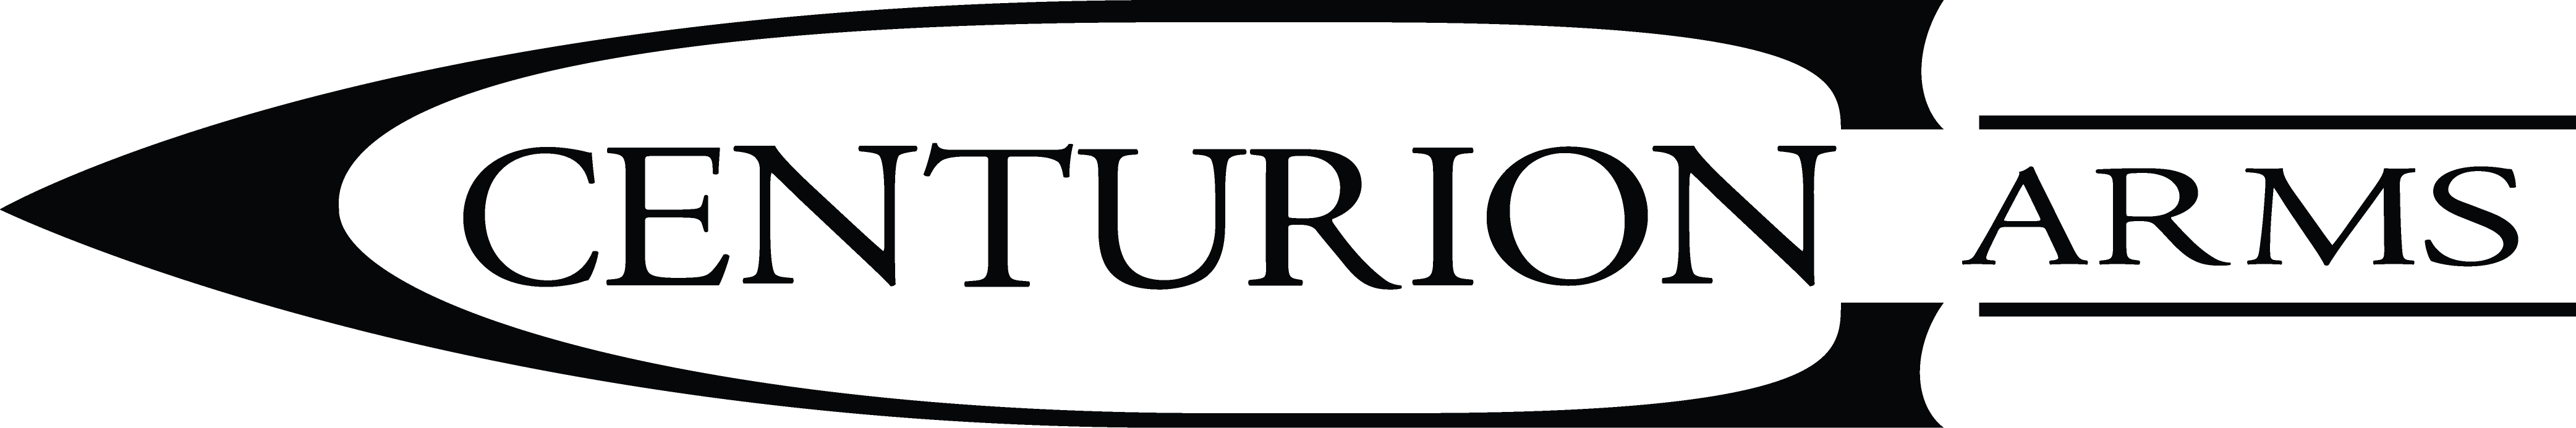 logo-centurion-arms-1-.png